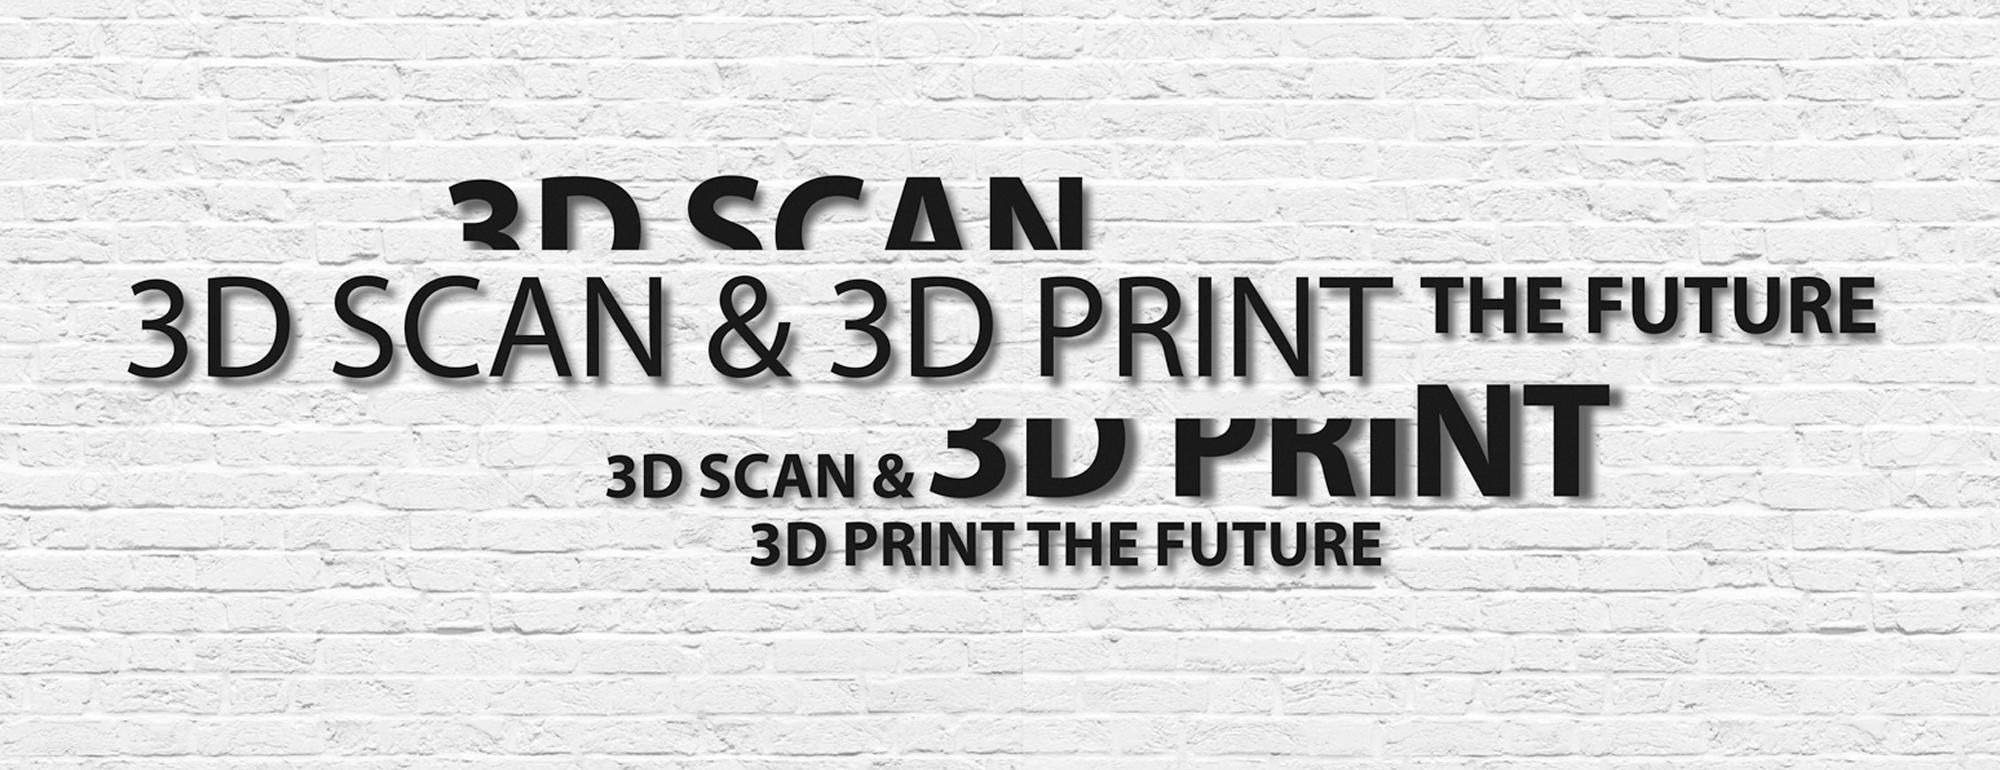 Unternehmen 3D-MODEL